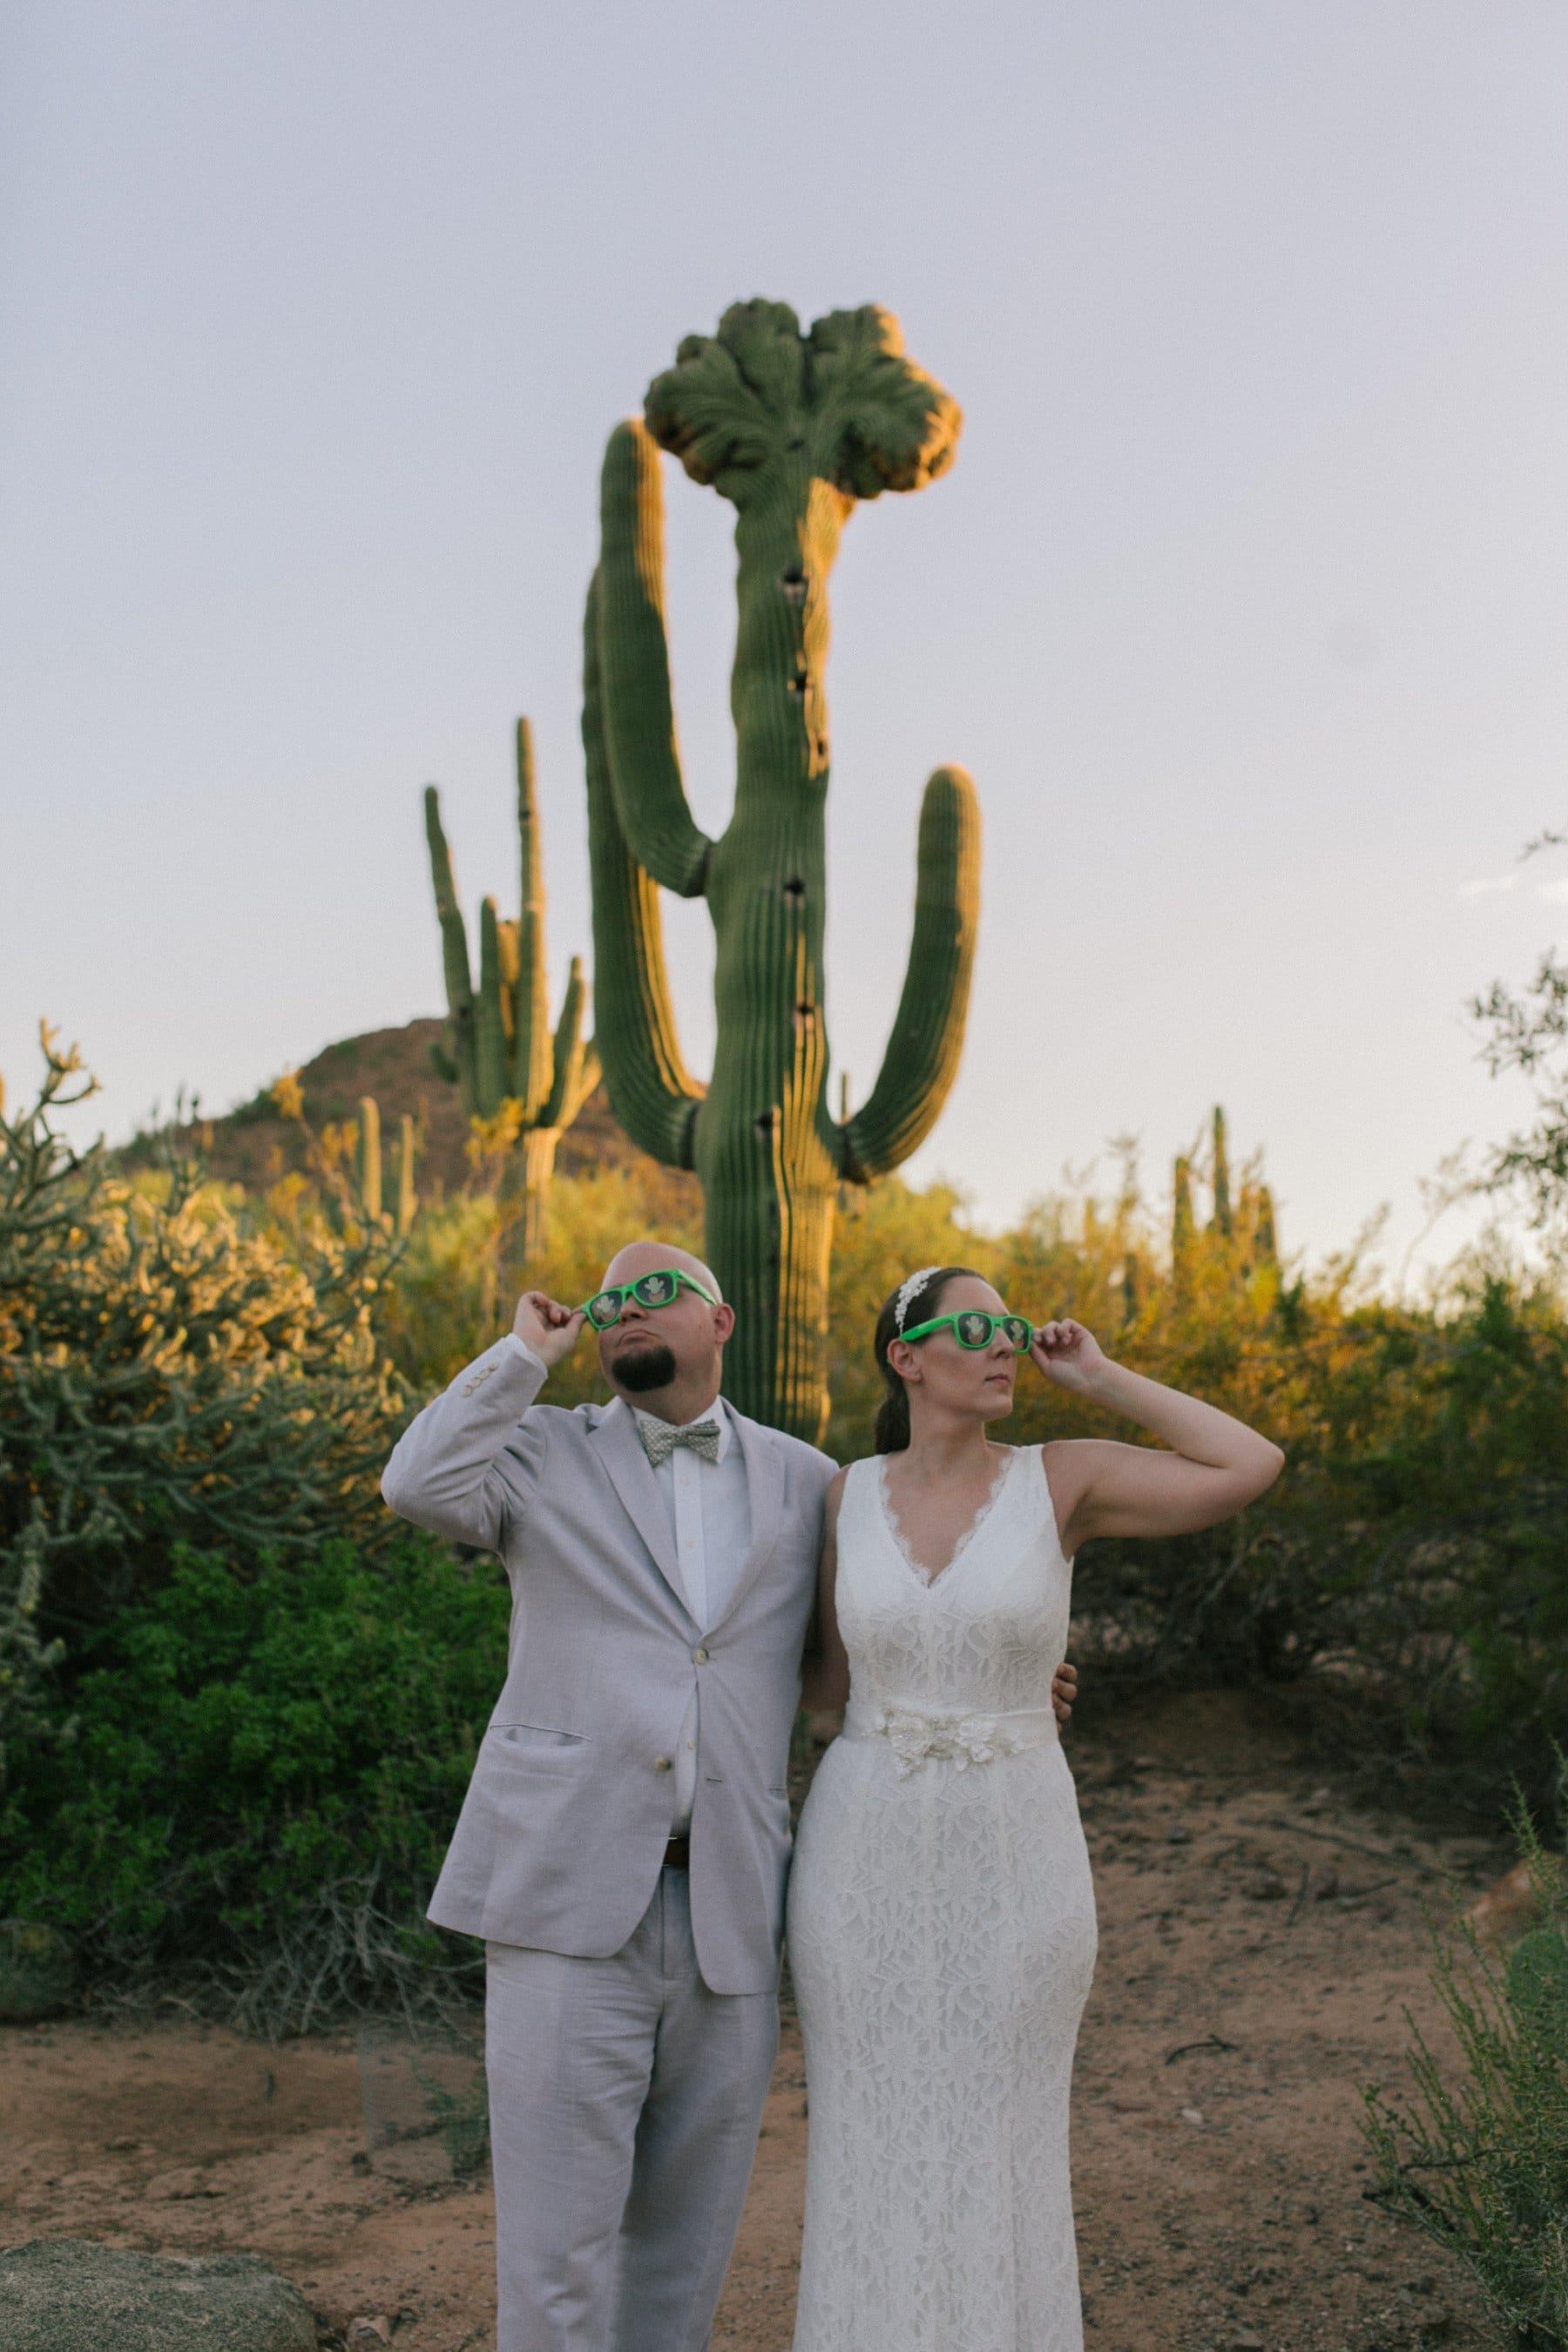 fun cool wedding photos at Desert Botanical Gardens